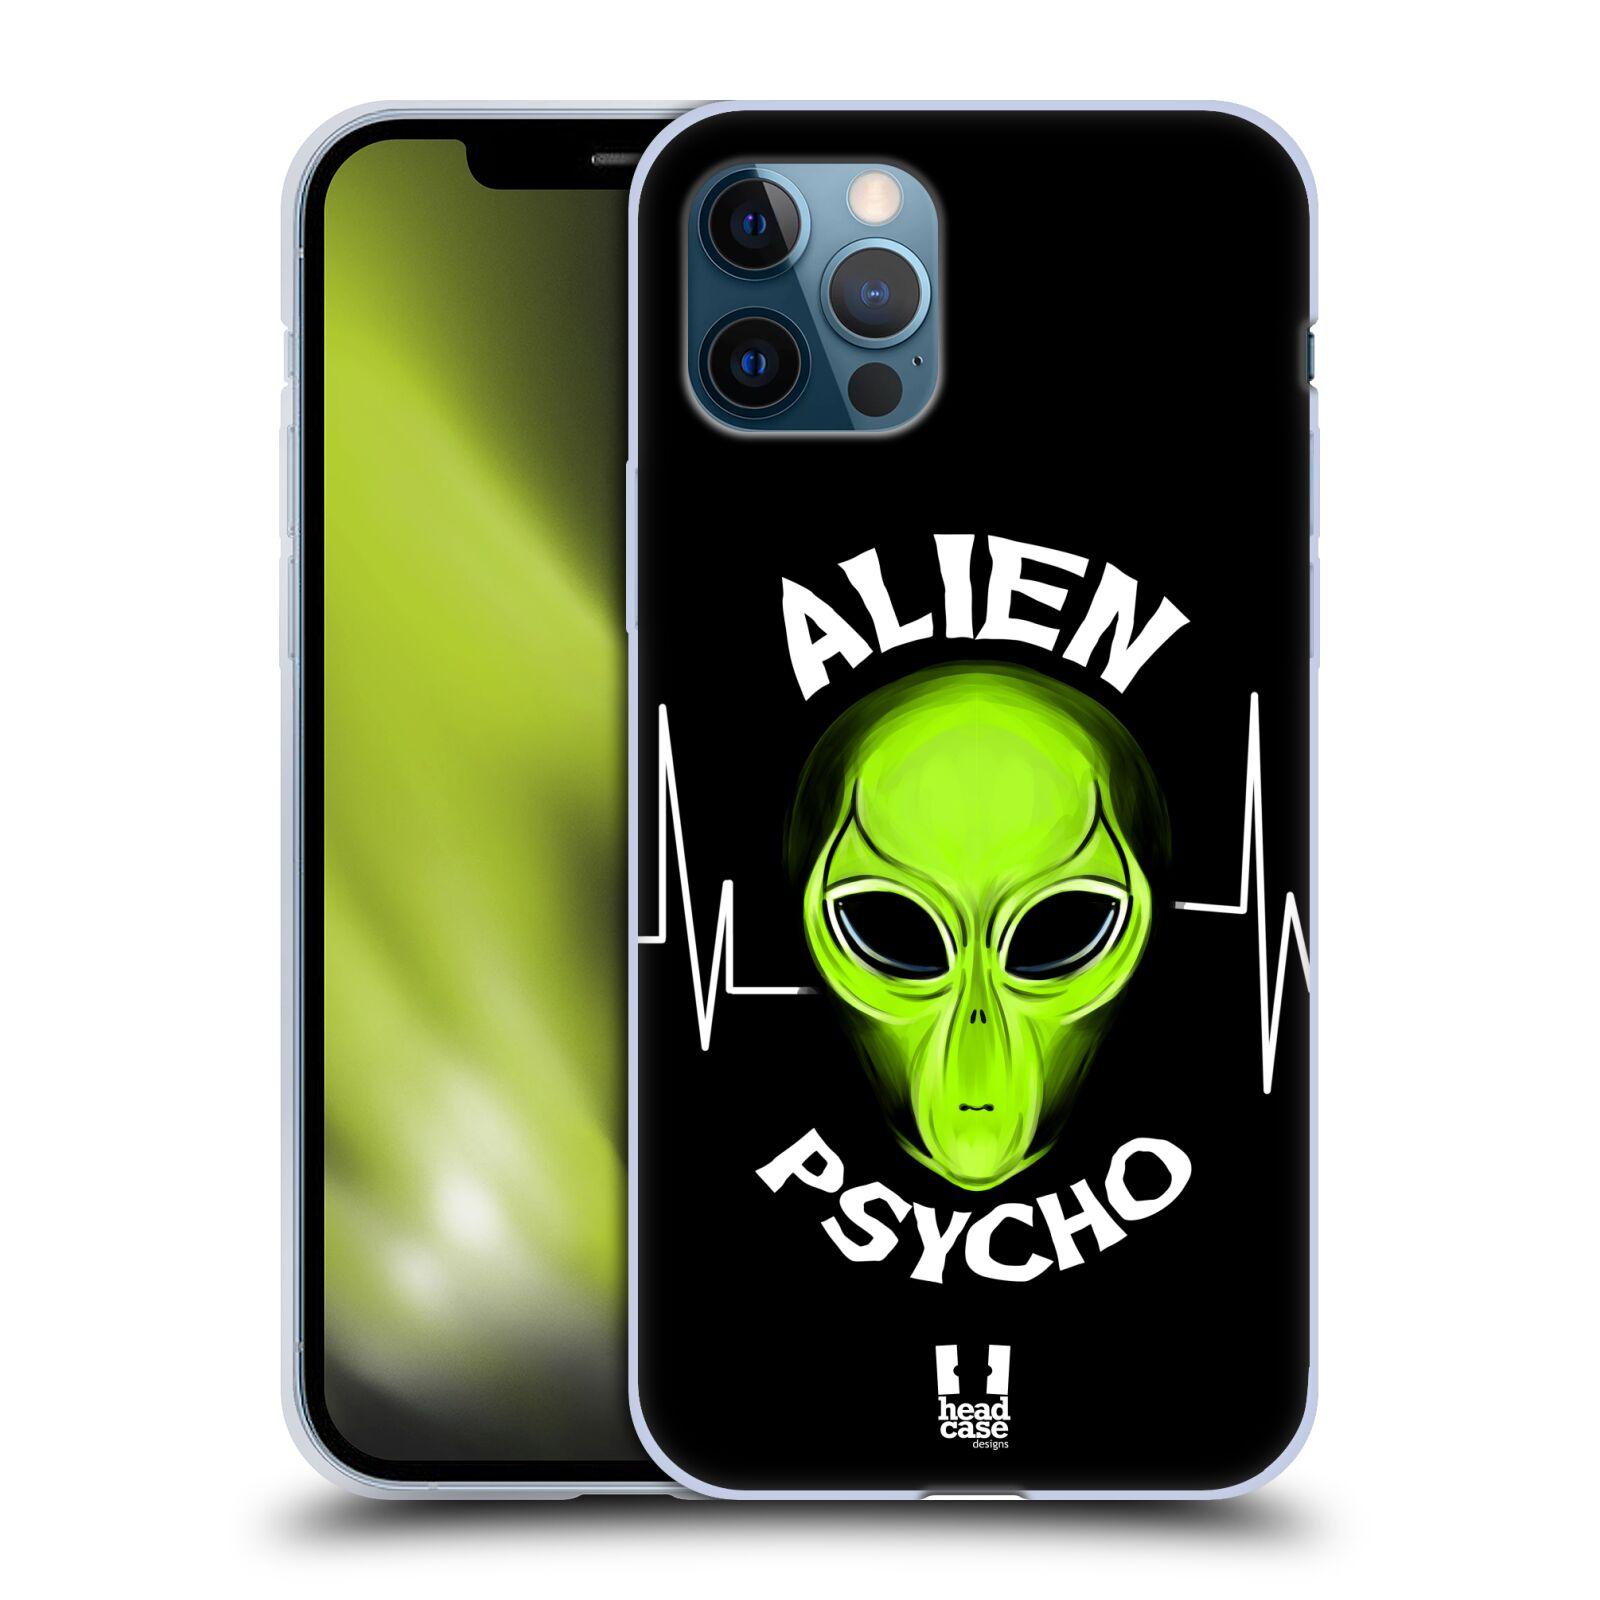 Silikonové pouzdro na mobil Apple iPhone 12 / 12 Pro - Head Case - ALIENS PSYCHO